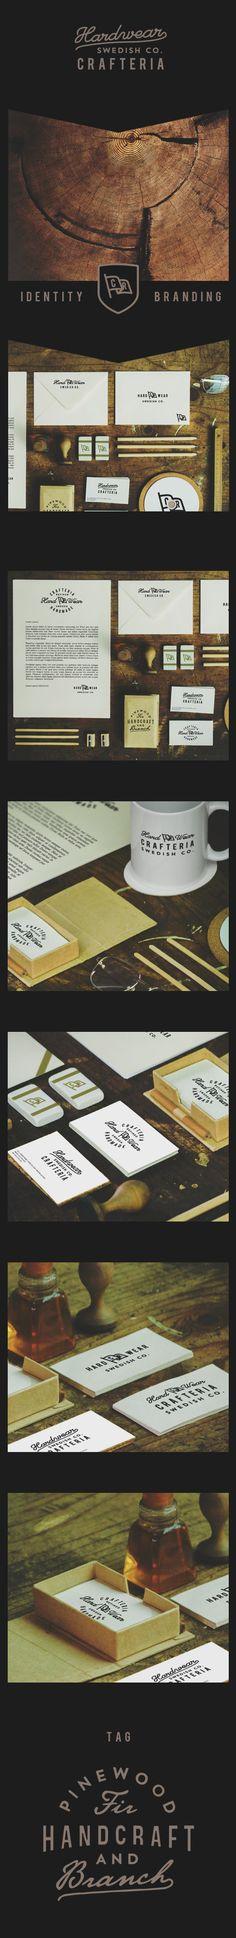 Hardwear Swedish Co. Crafteria branding   Authentic China Identity by Yohanes Raymond